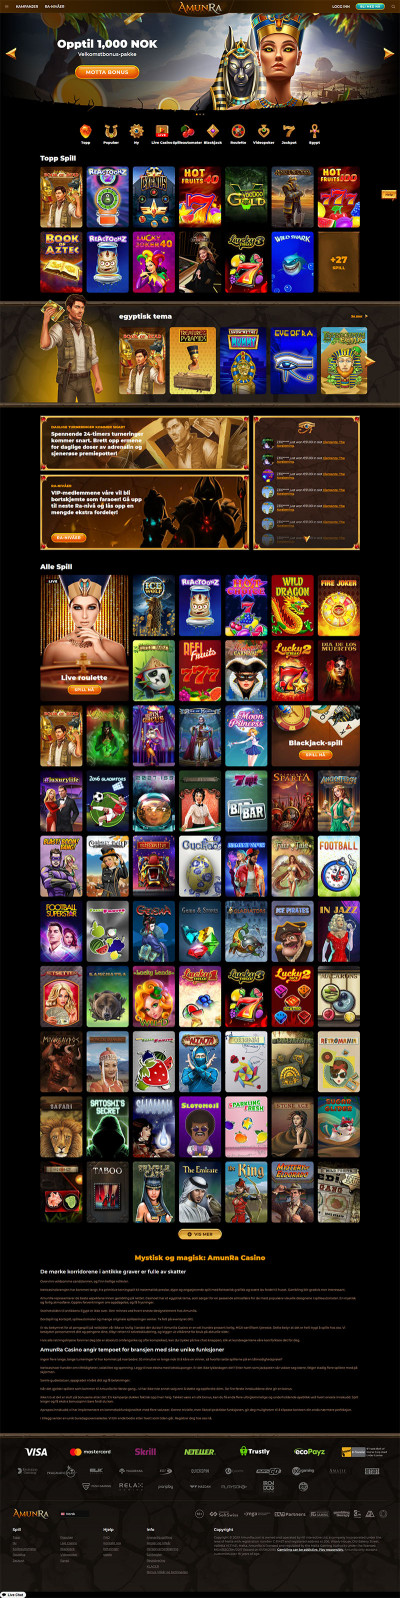 AmunRa Casino Screenshot